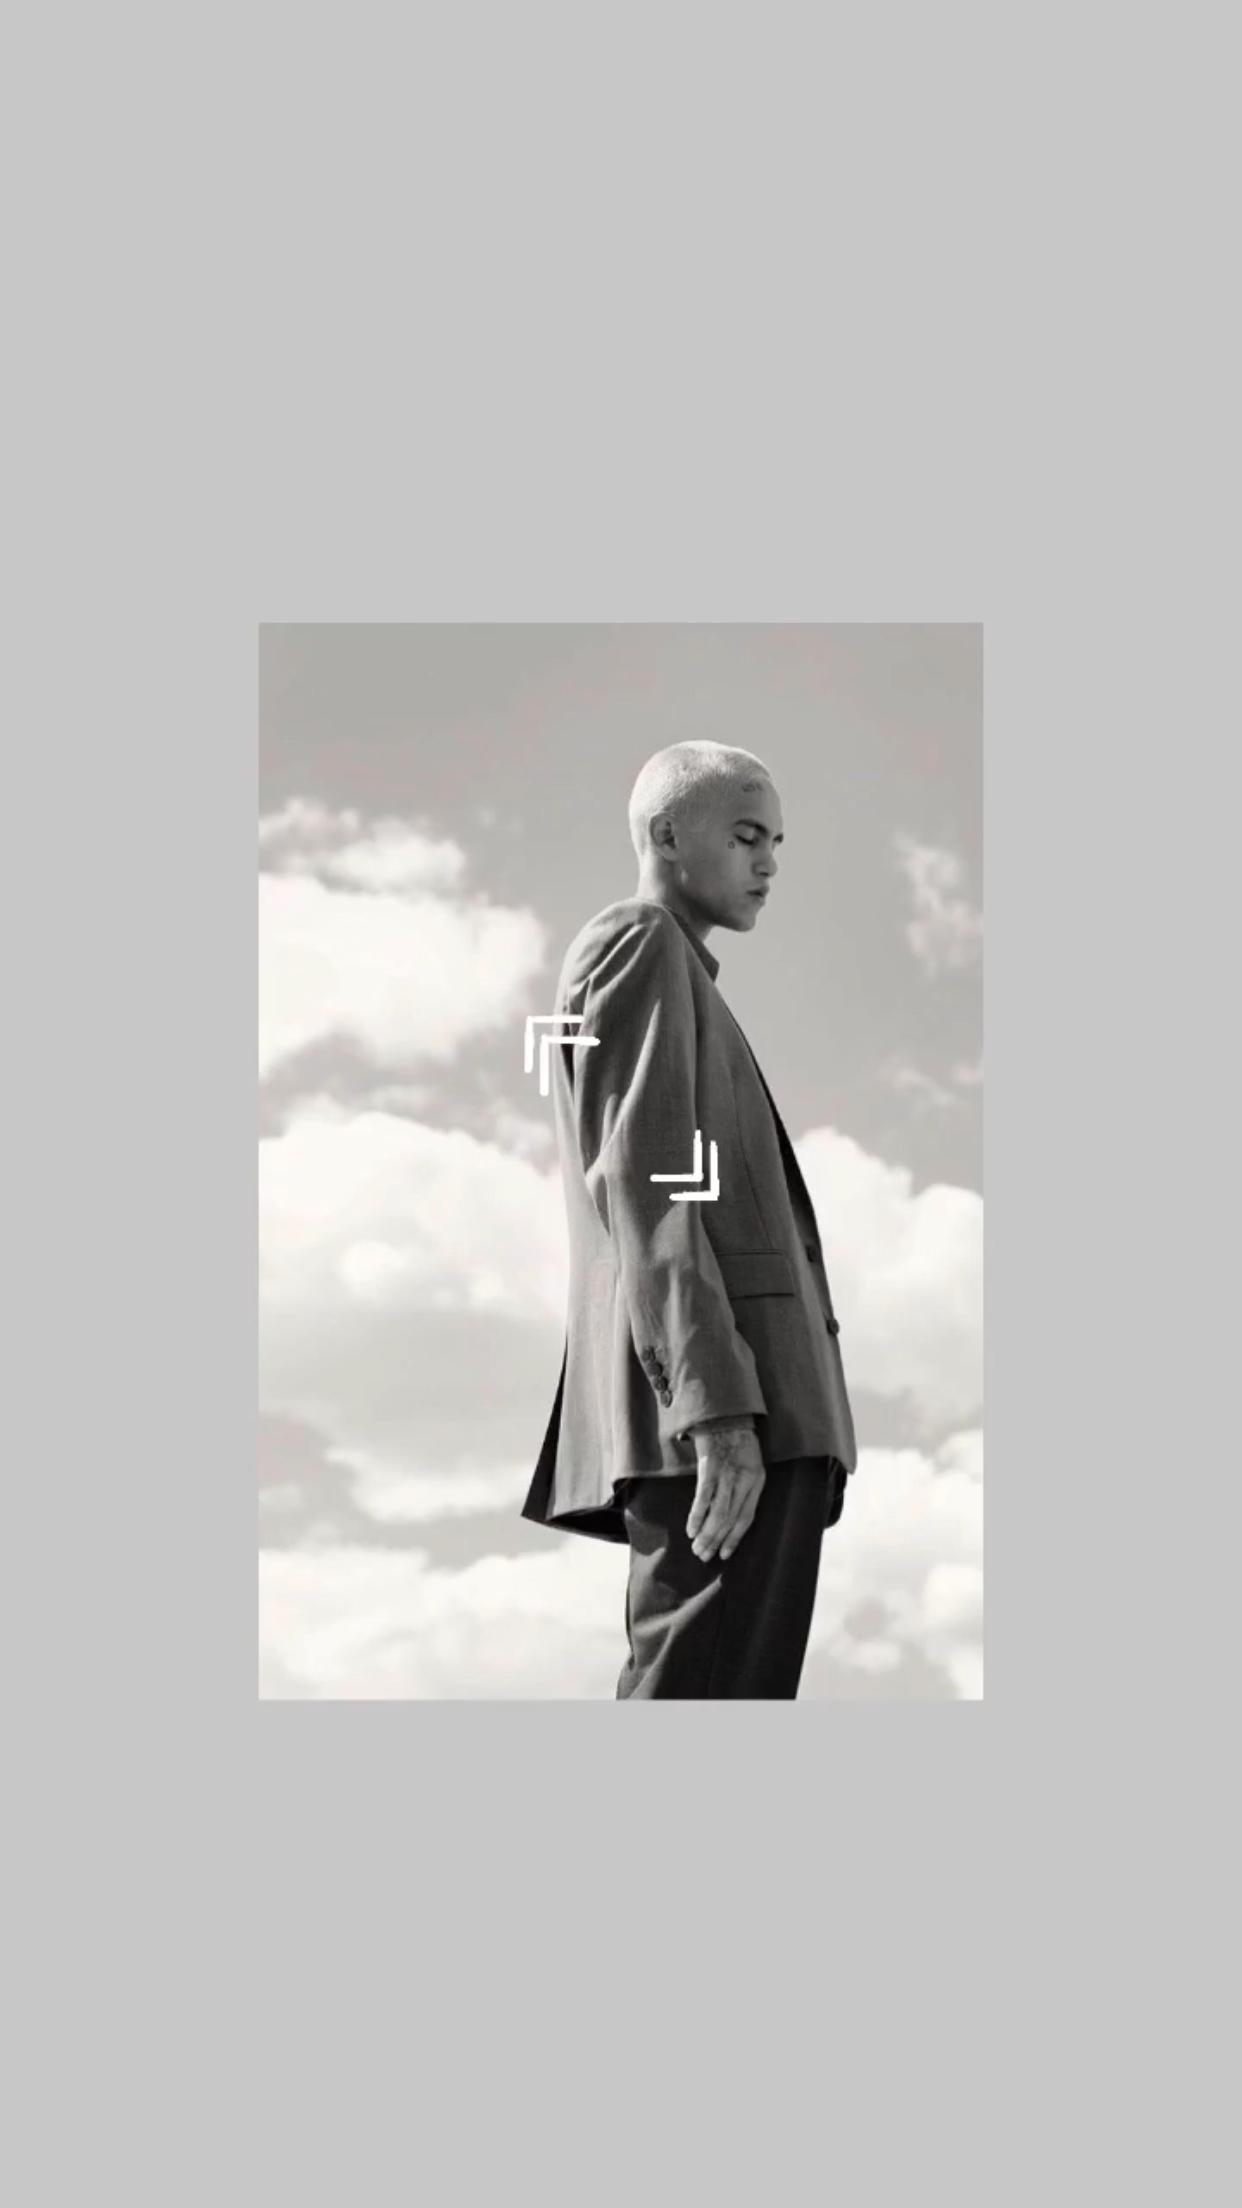 Dominic Fike Wallpaper In 2020 White Background Photography Black And White Background Wallpaper